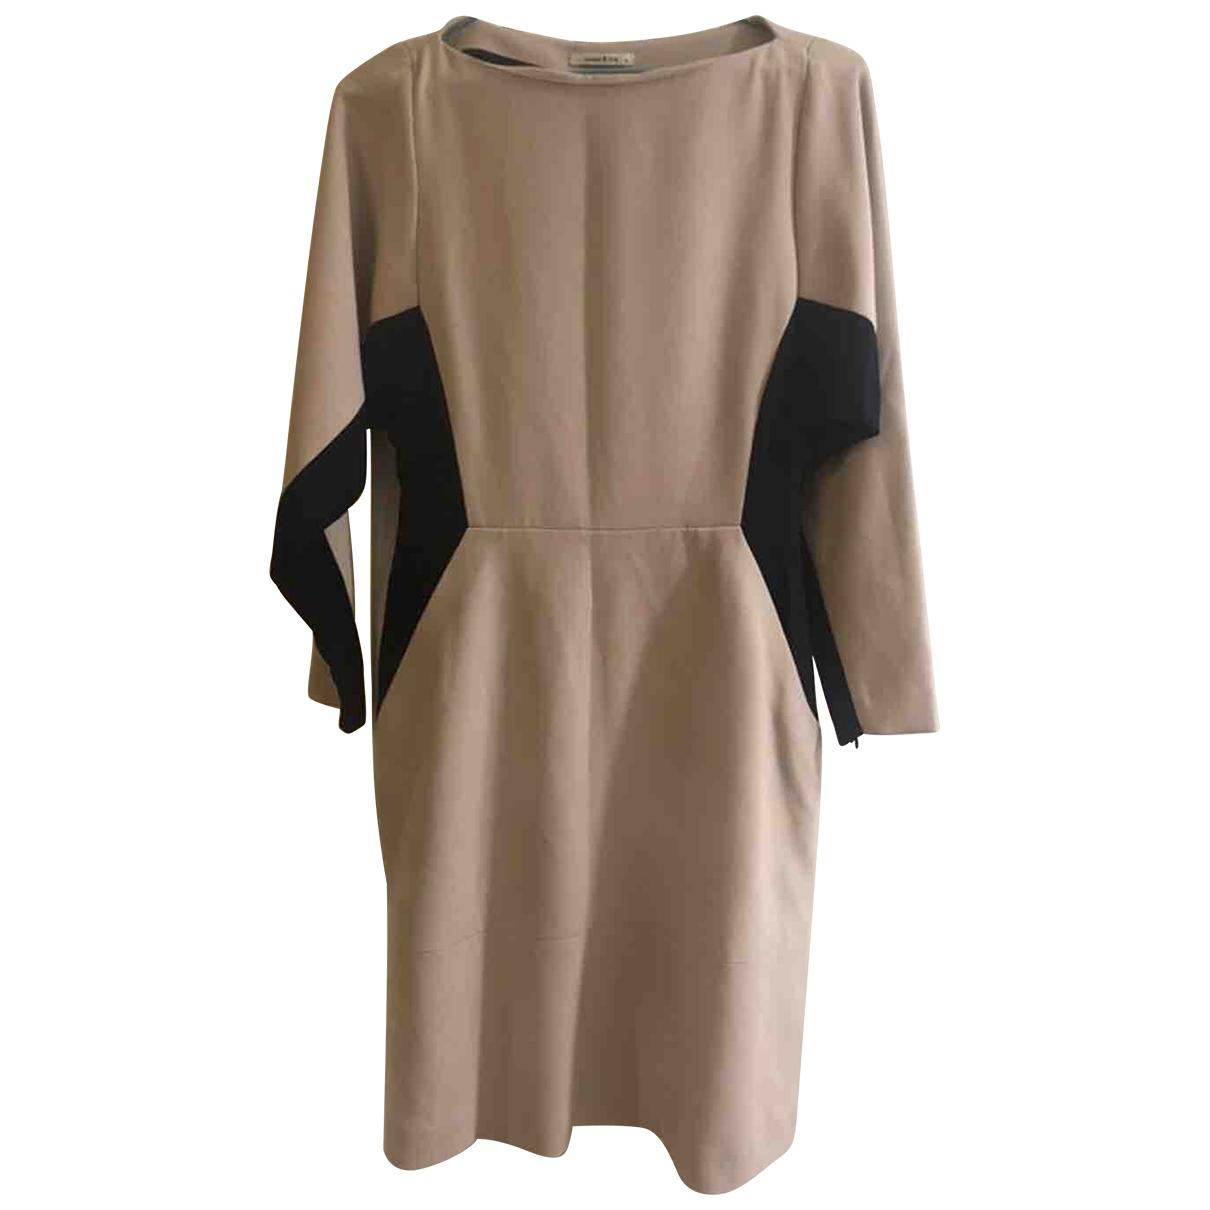 Bimba Y Lola \N Ecru dress for Women S International